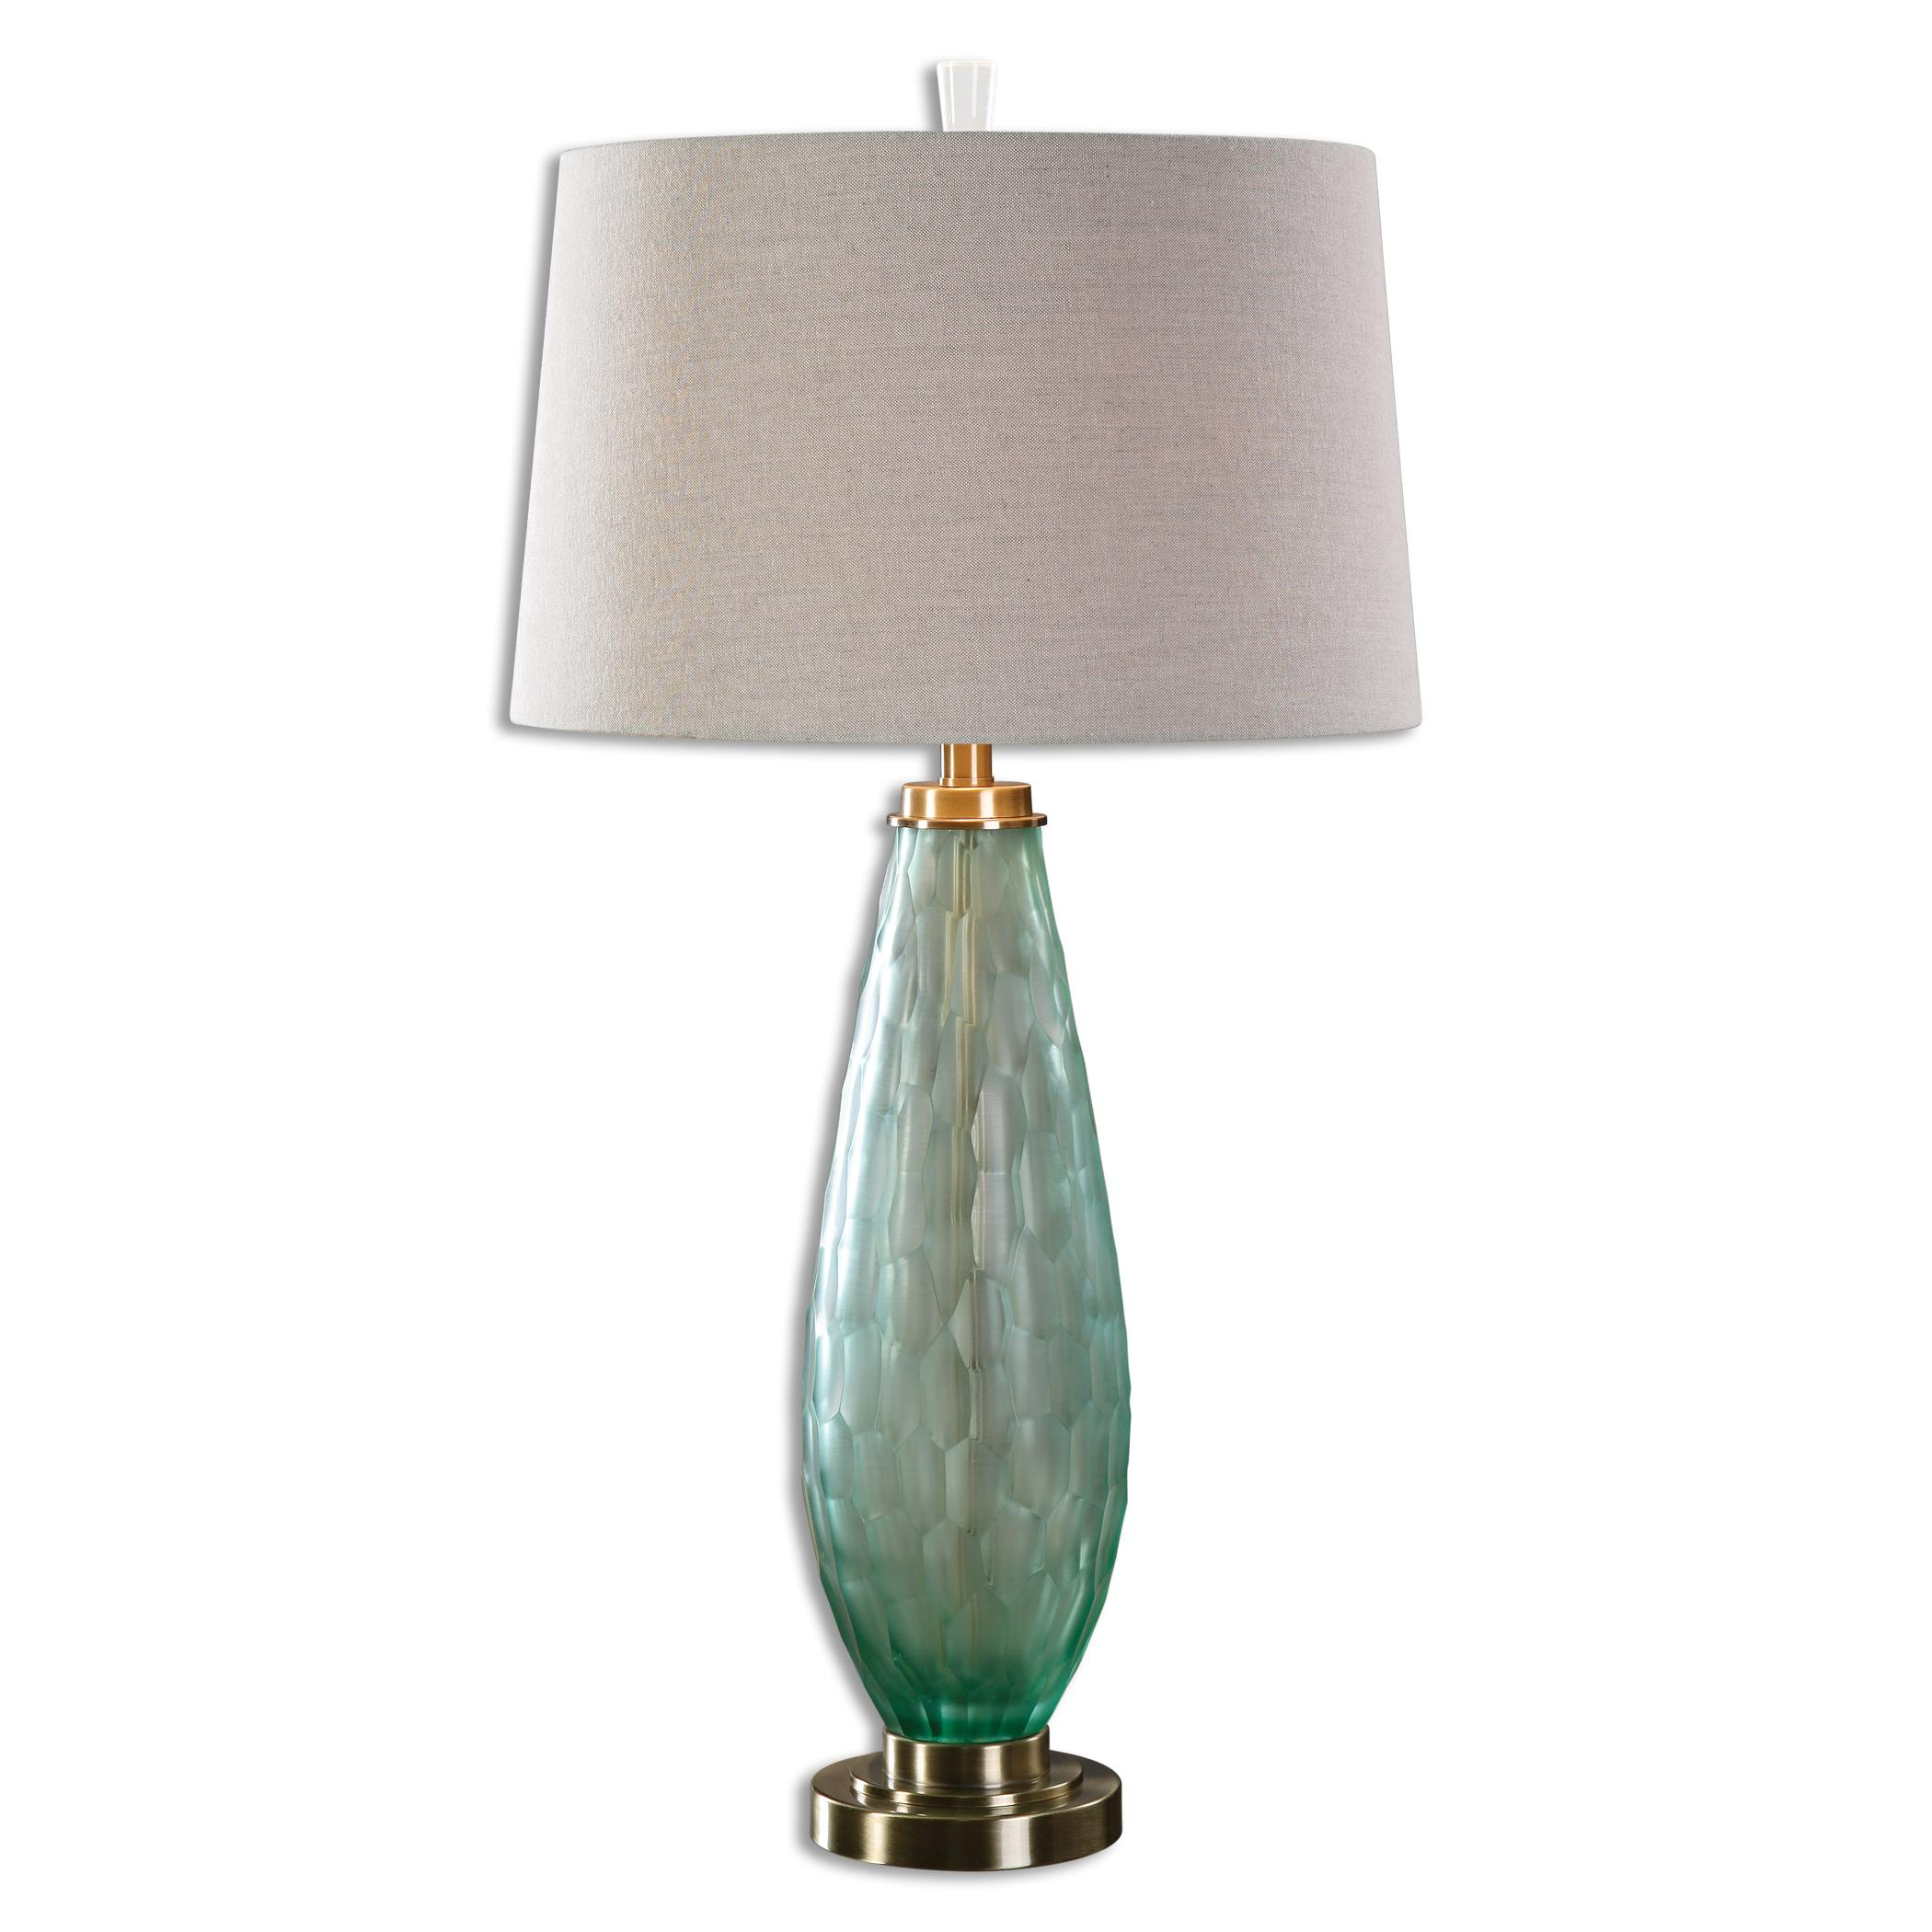 Lenado Sea Green Glass Table Lamp